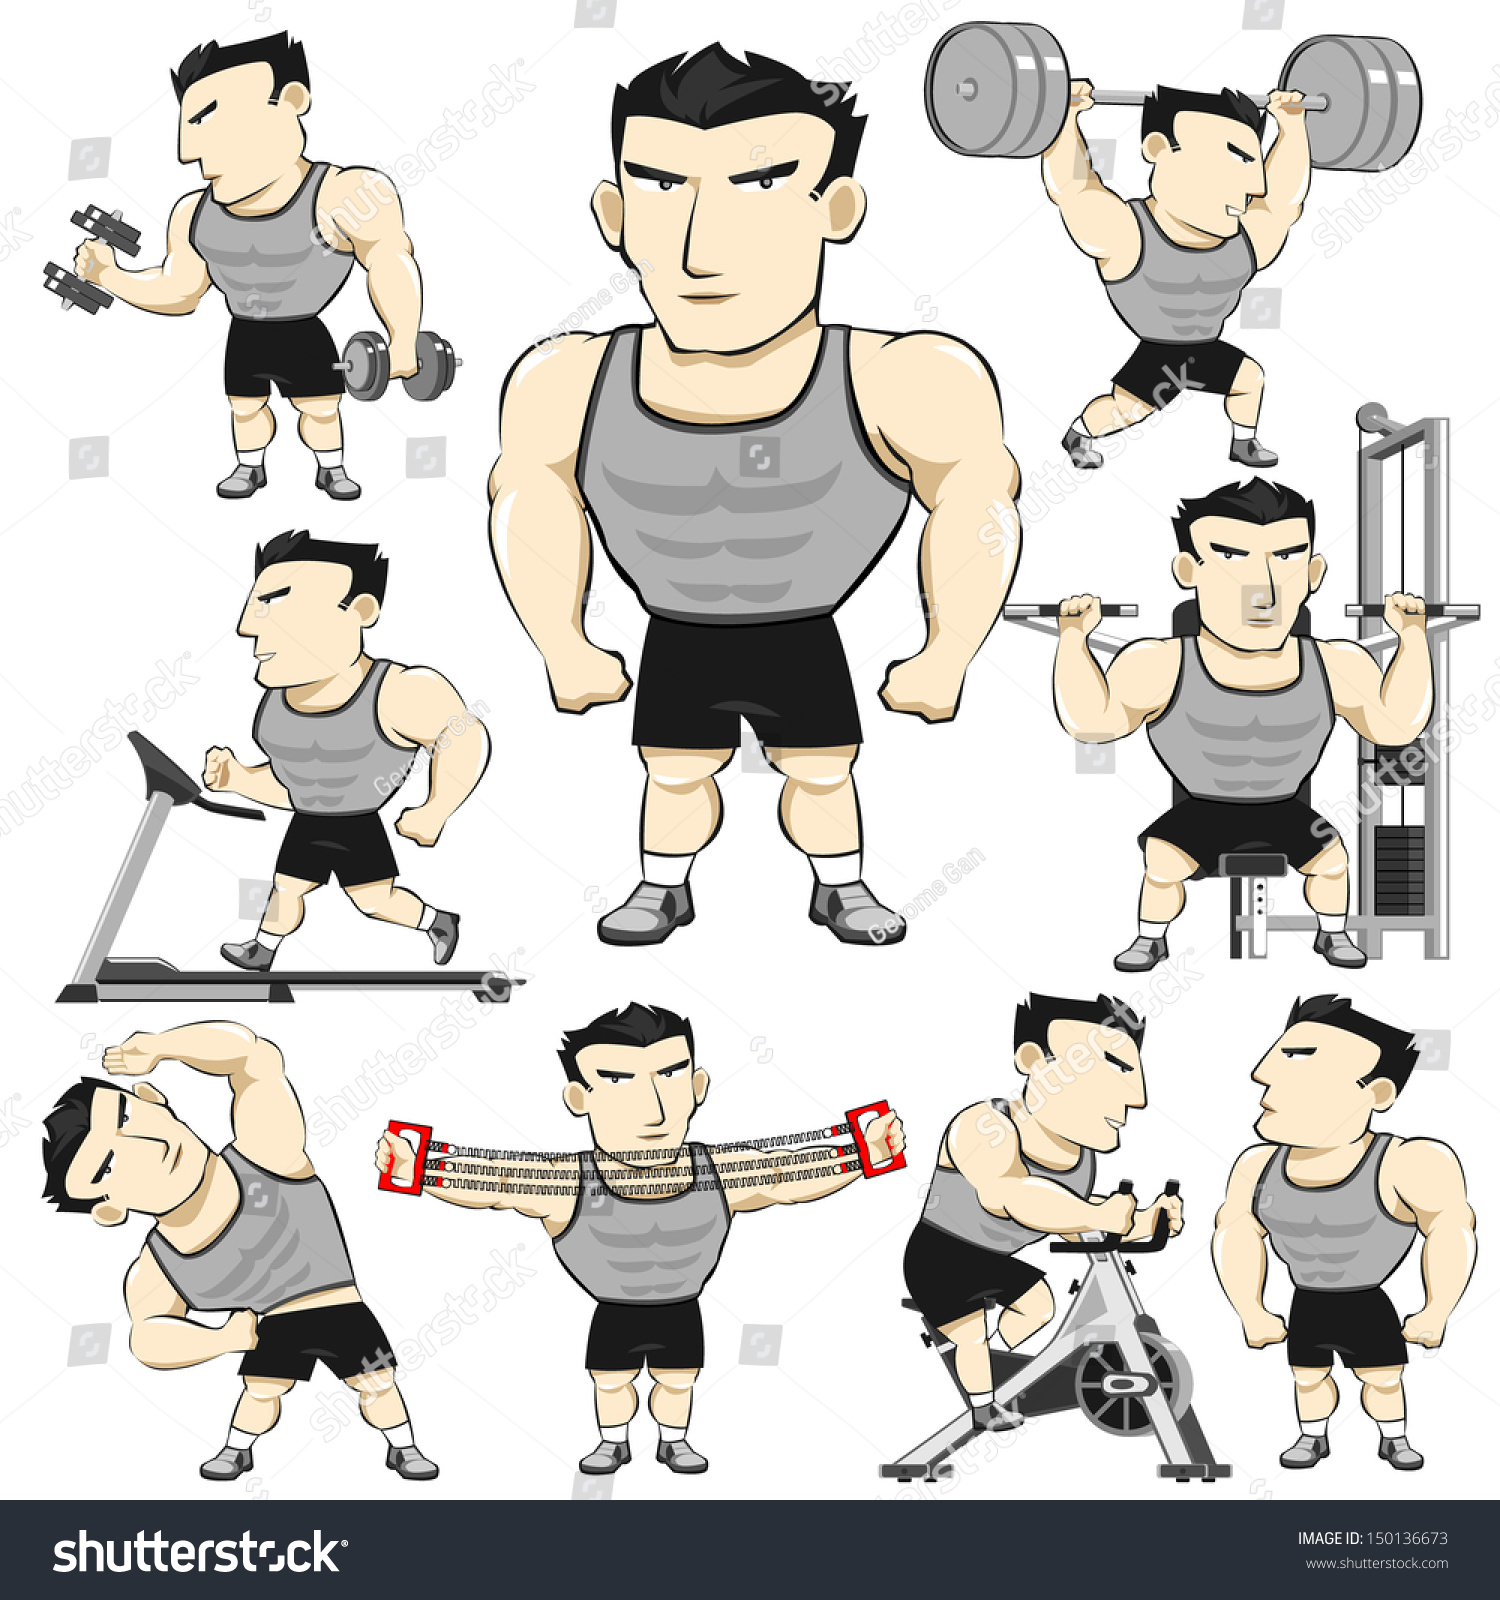 Fitness man activities pack cartoon stock vector 150136673 - Fitness cartoon pics ...